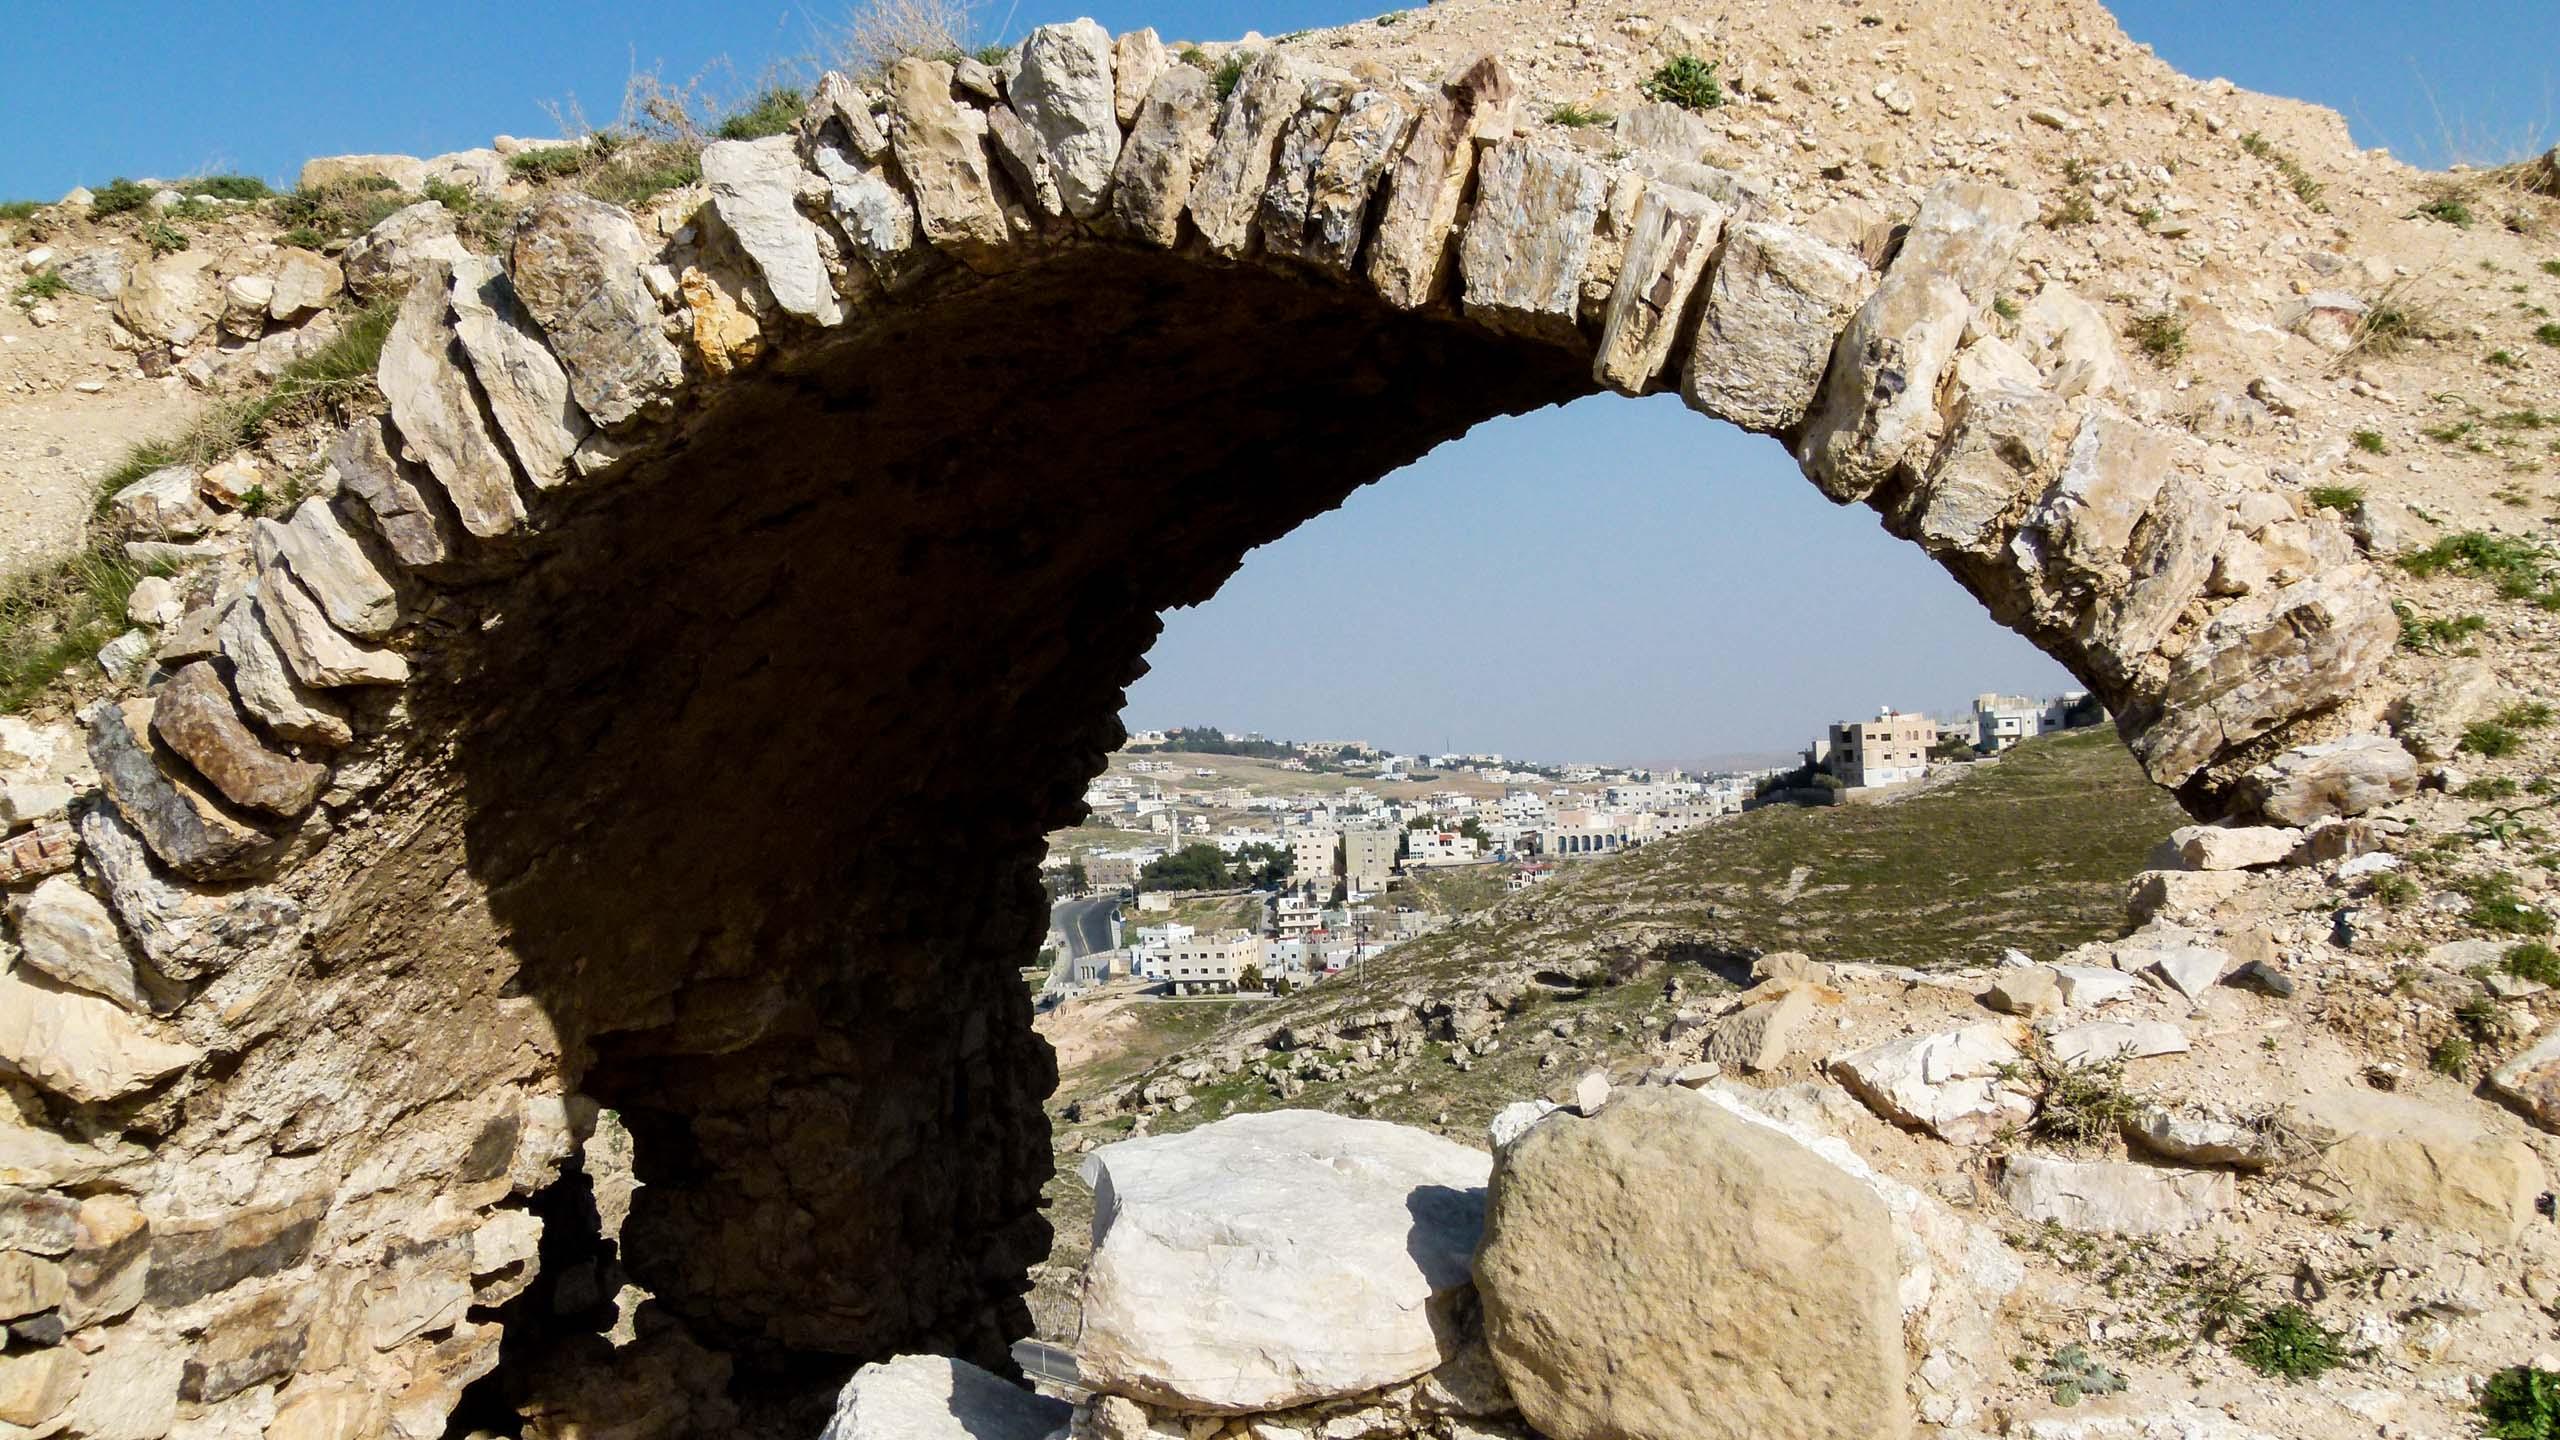 Rock archway in Jordan